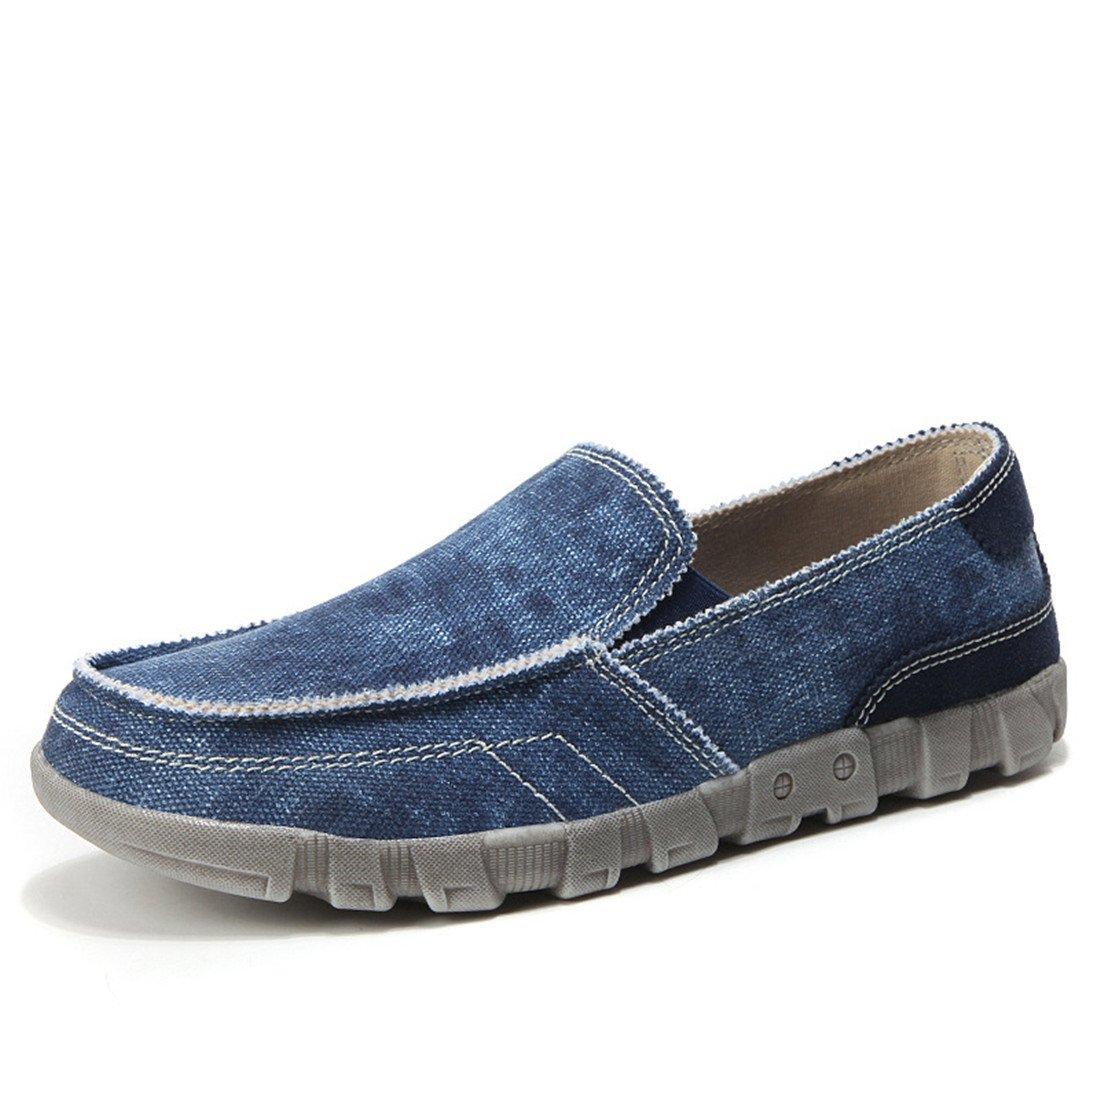 SKY-Maria Herren Sommer Mode Segeltuchschuhe Licht Atmungsaktiv Flache Schuhe Rutschfest Lässige Schuhe Große Größe 39-48